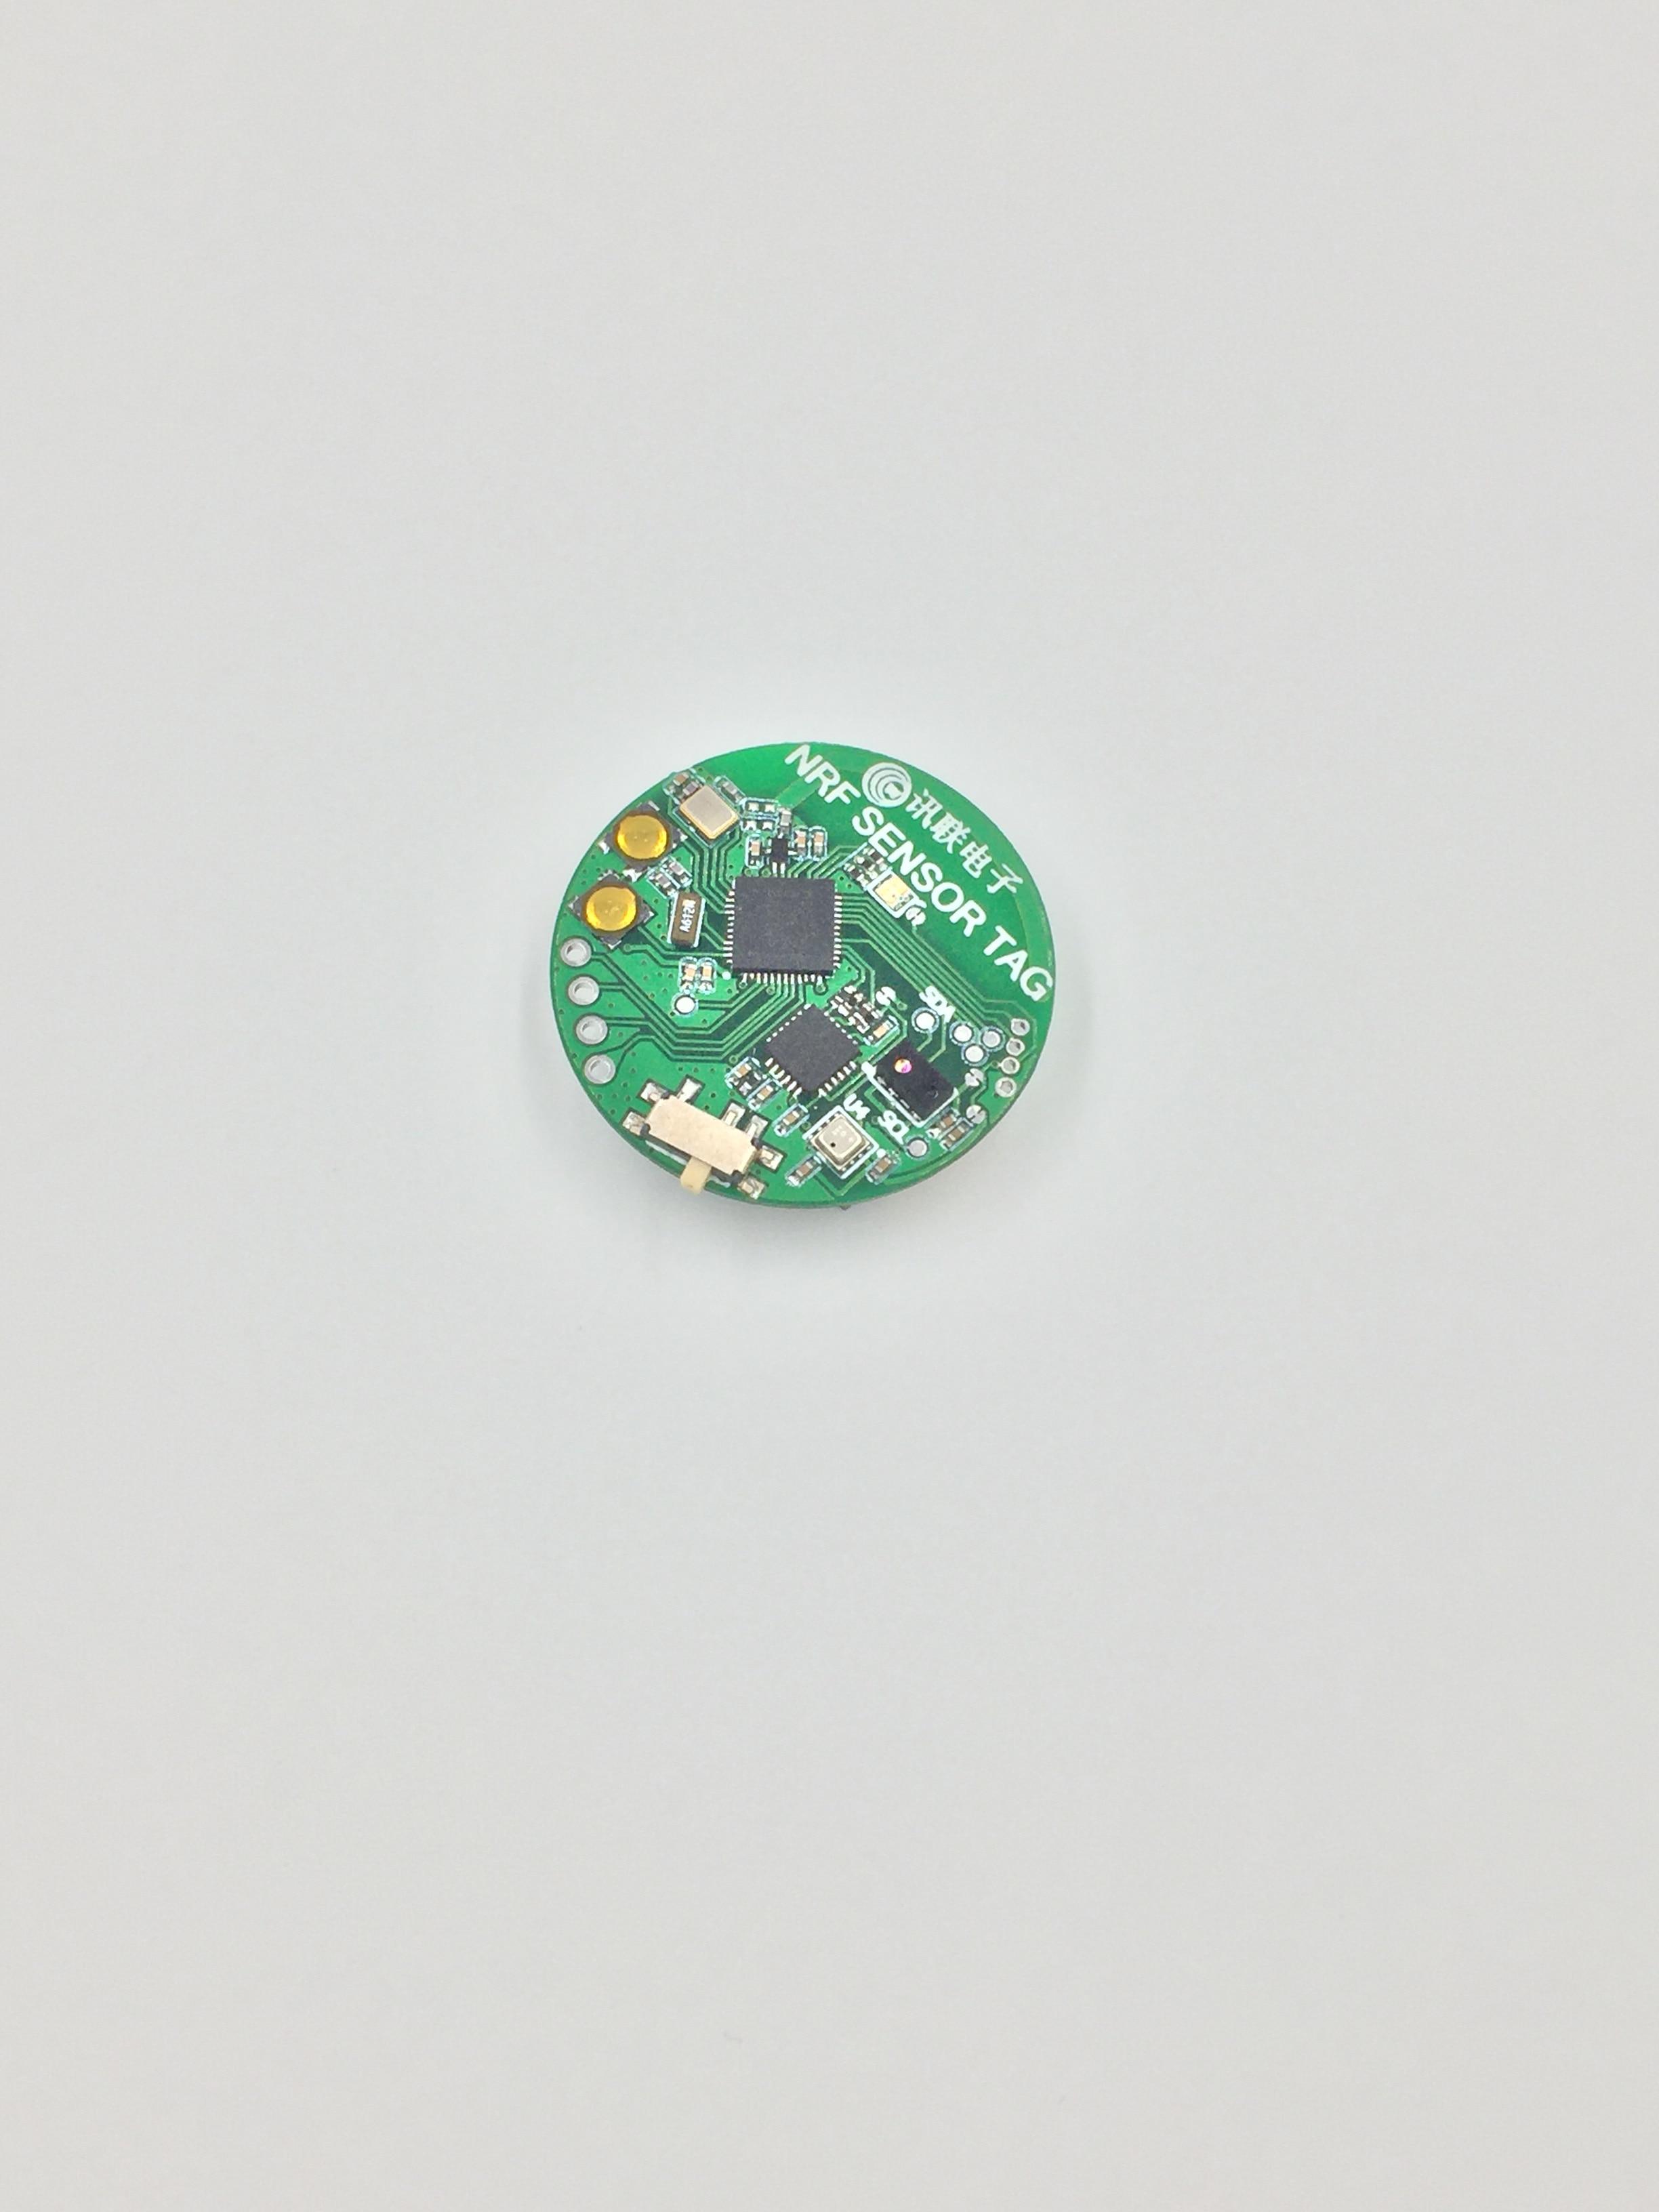 Bluetooth 4 Temperature, Pressure and Humidity Sensors, Acceleration Gyro, Ambient Light Sensor BME280  [sa] rs485 network based temperature and humidity transmitter temperature and humidity sensors replacing genuine original e